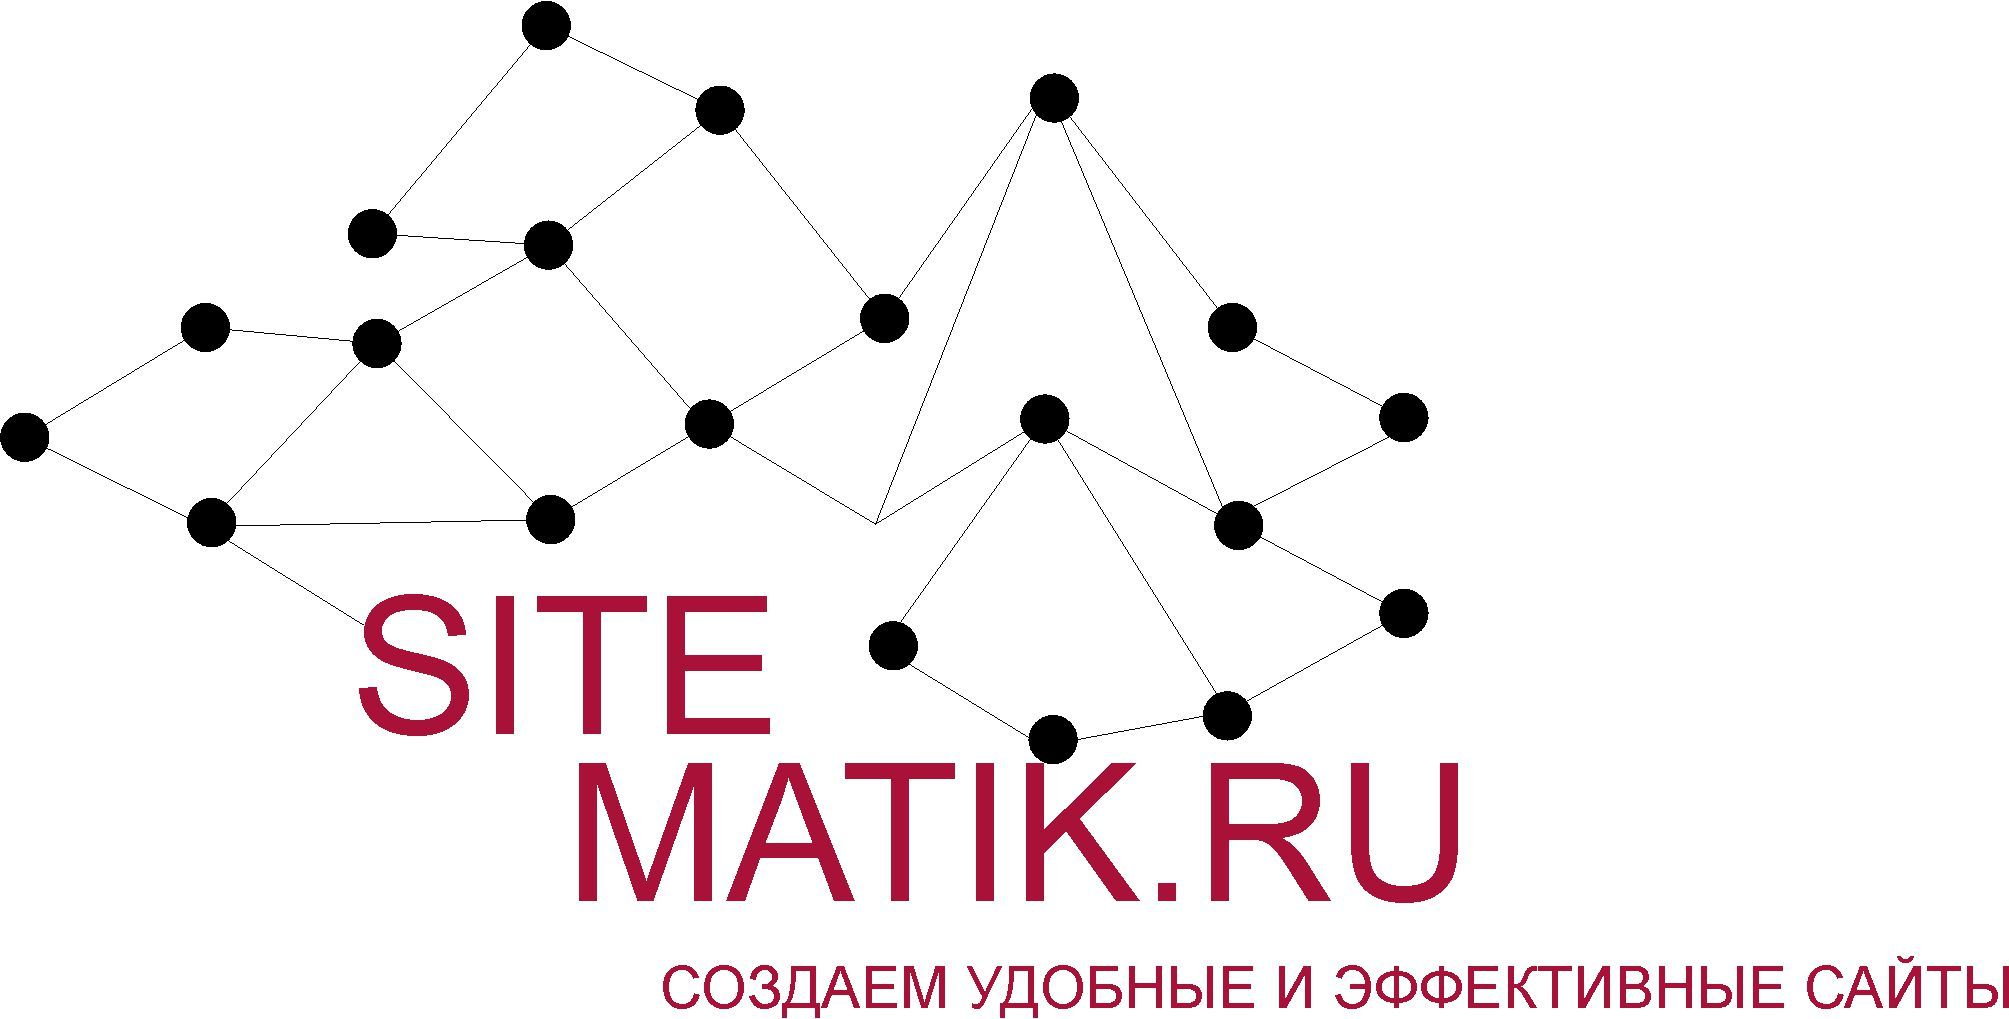 Логотип для Веб-студии - дизайнер Krasivayav